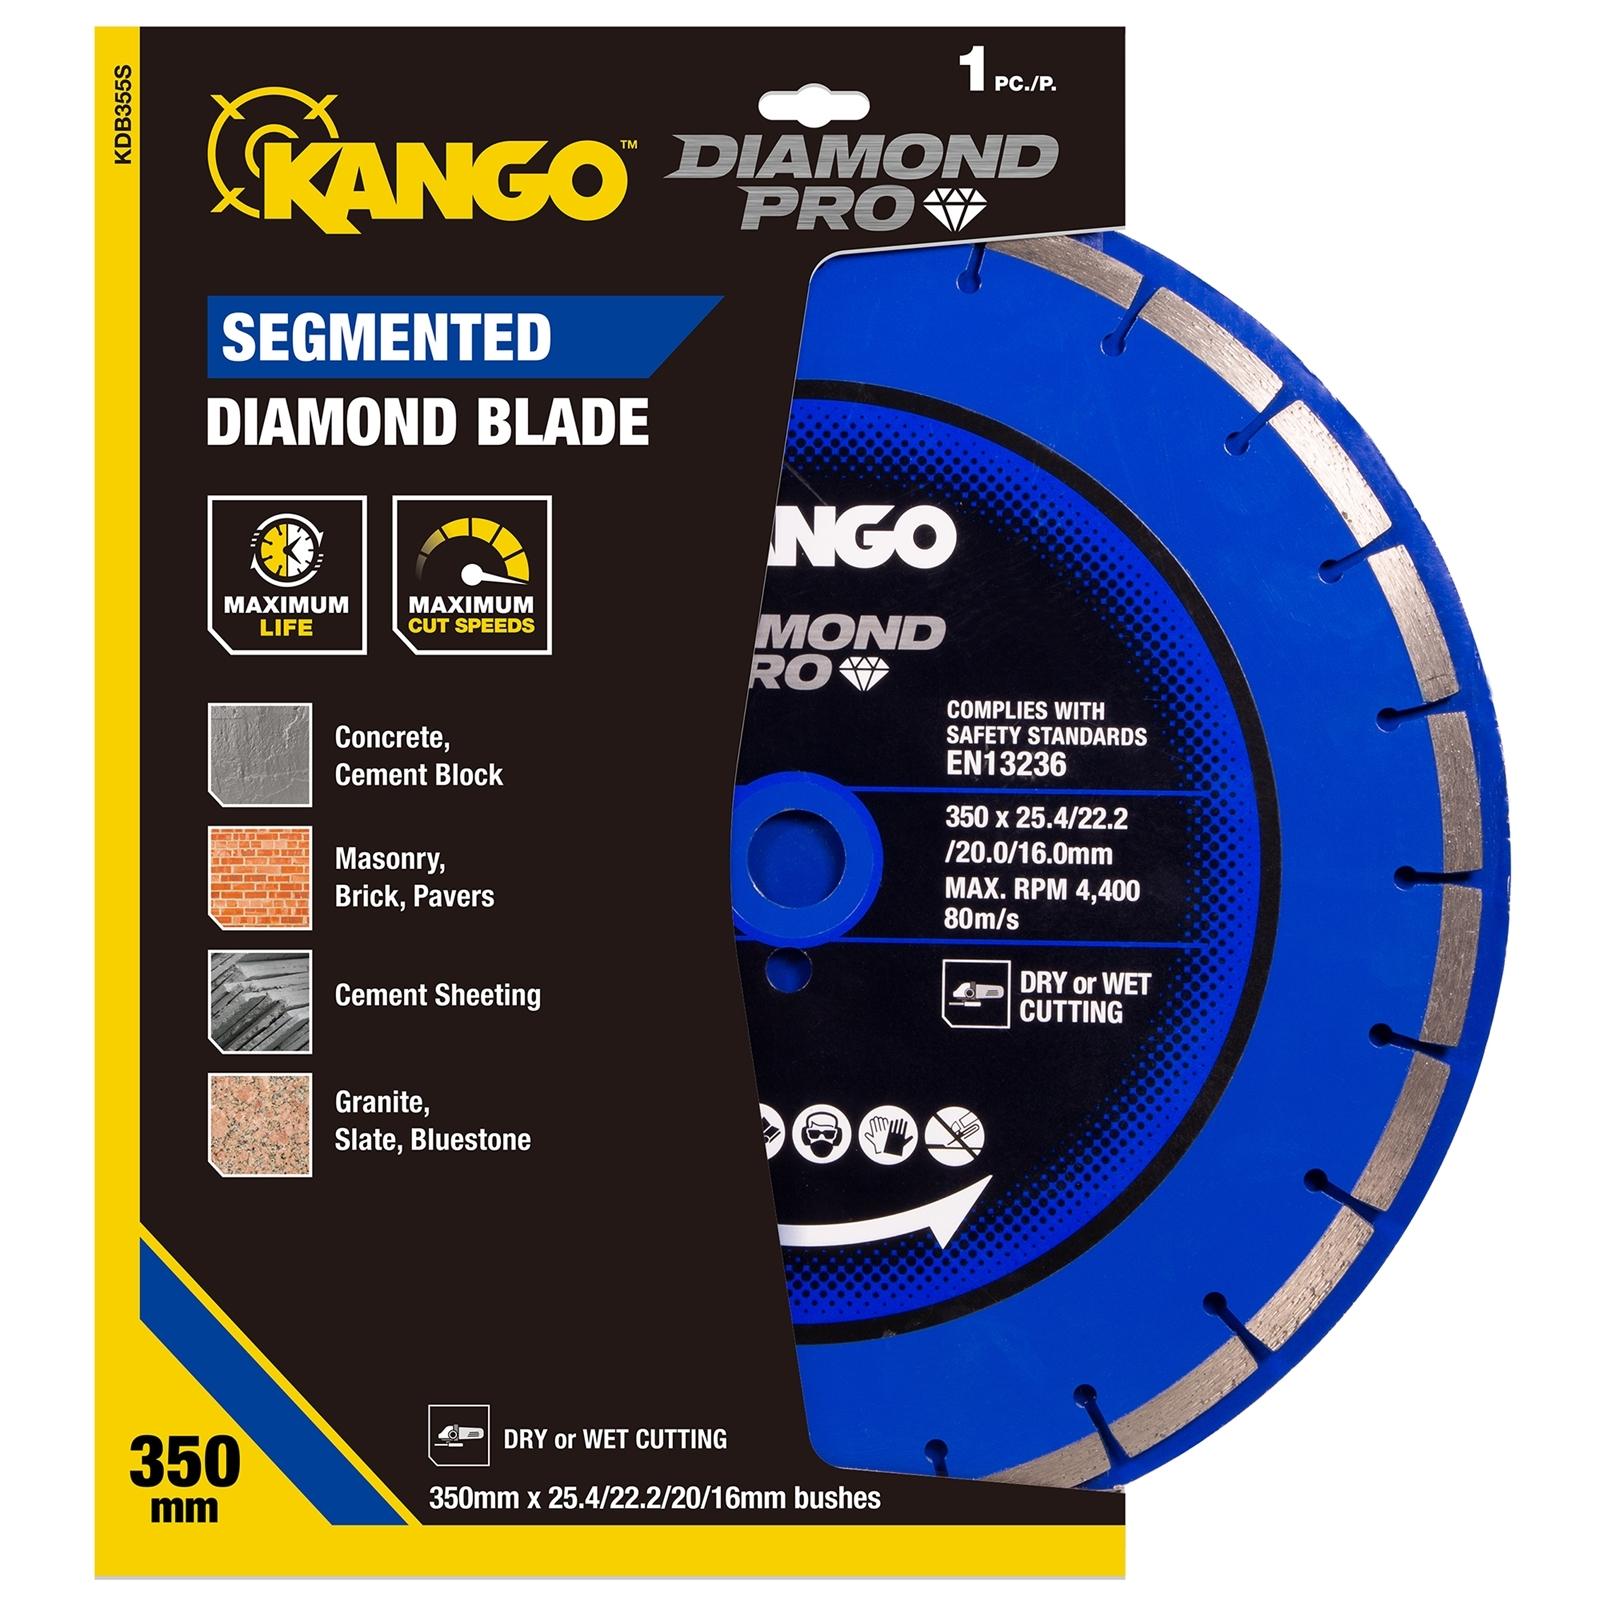 Kango 350mm Segmented Diamond Blade